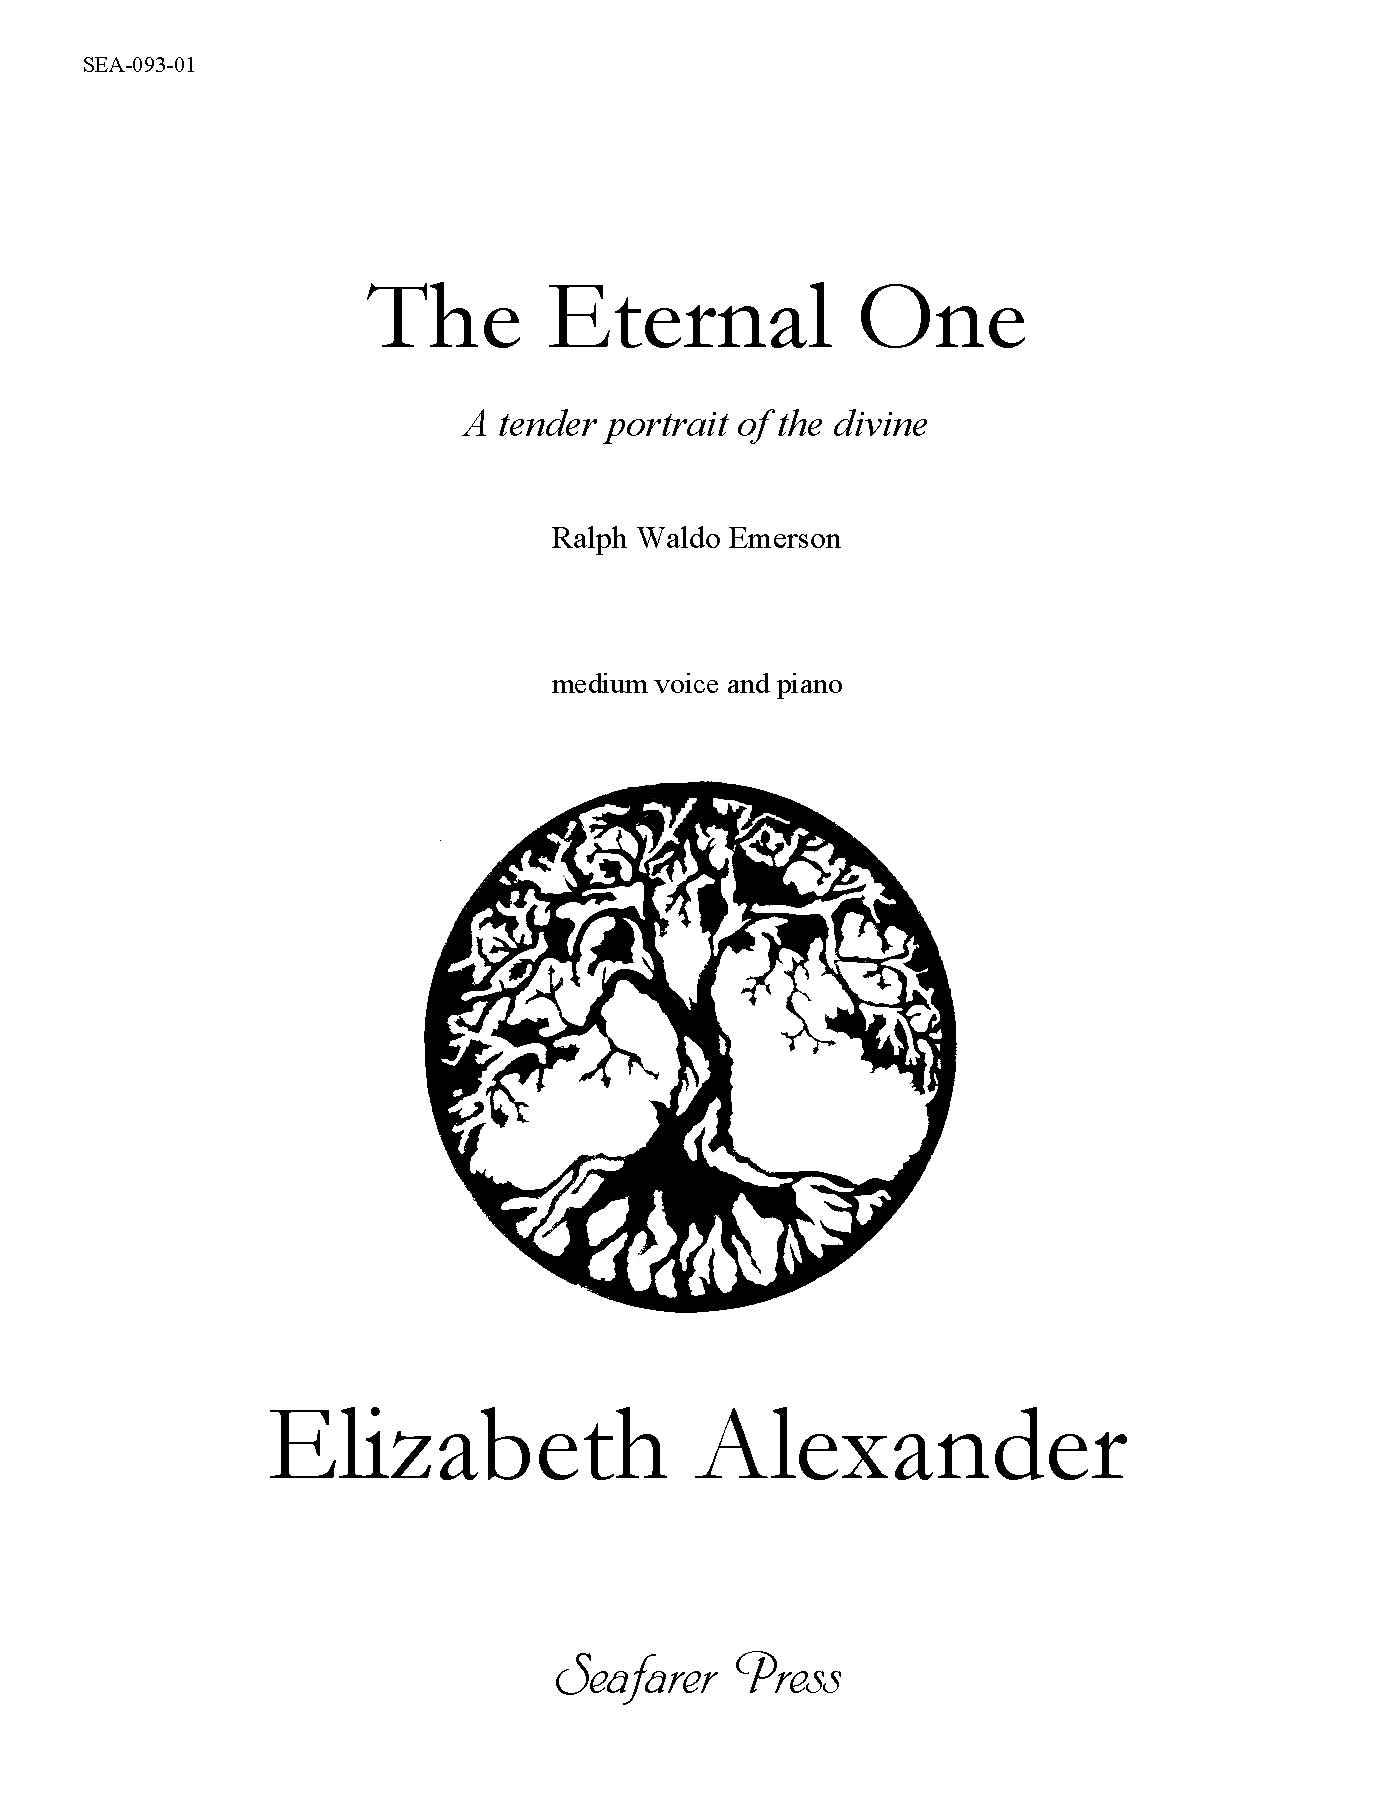 SEA-093-01 - The Eternal One